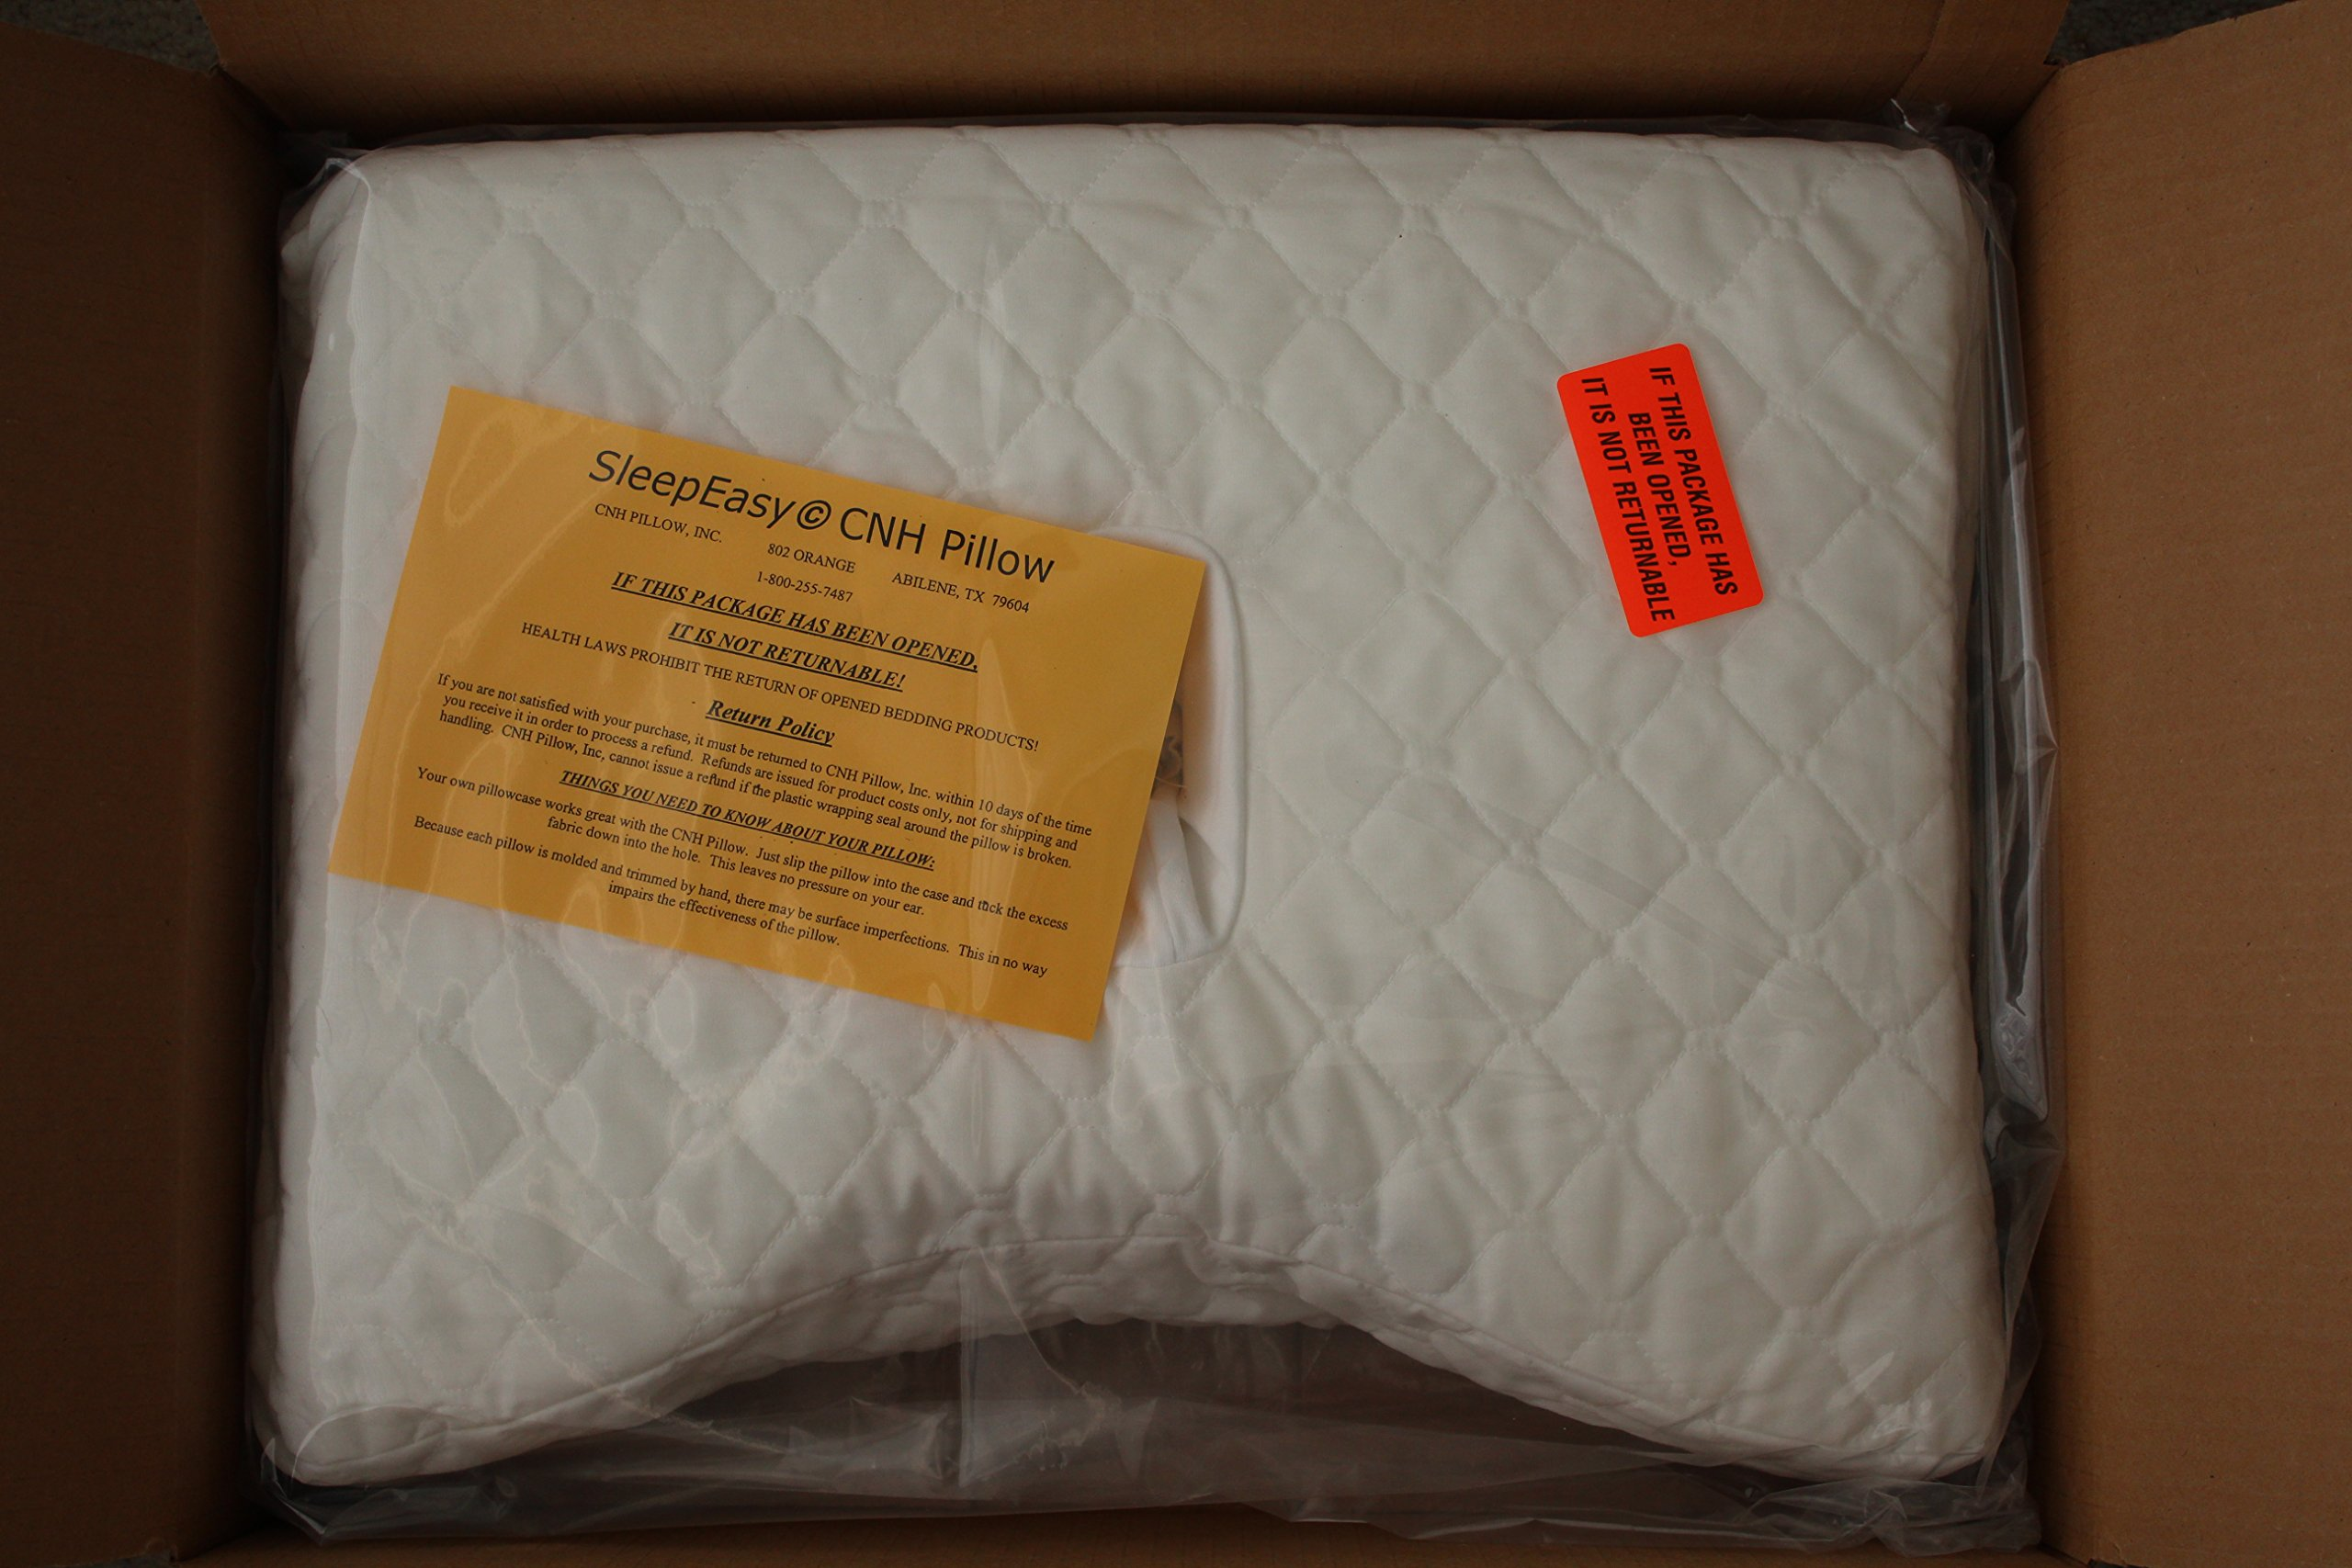 SleepEasy CNH Pillow